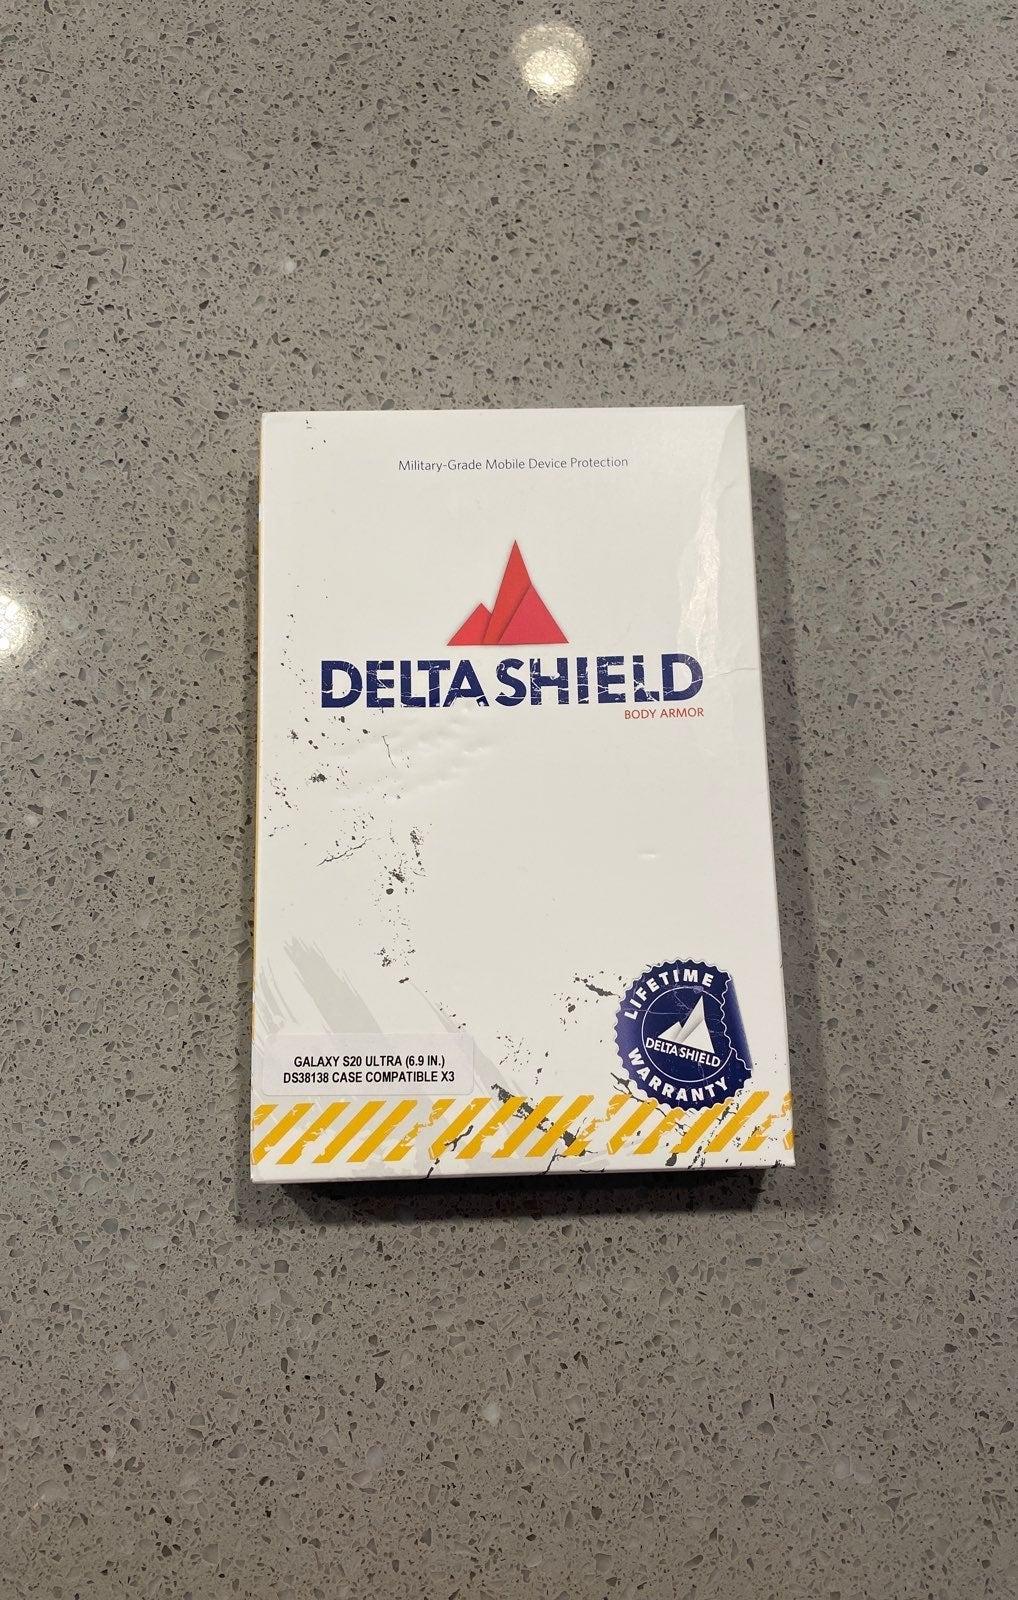 Galaxy S20 Ultra Delta Shield Protector